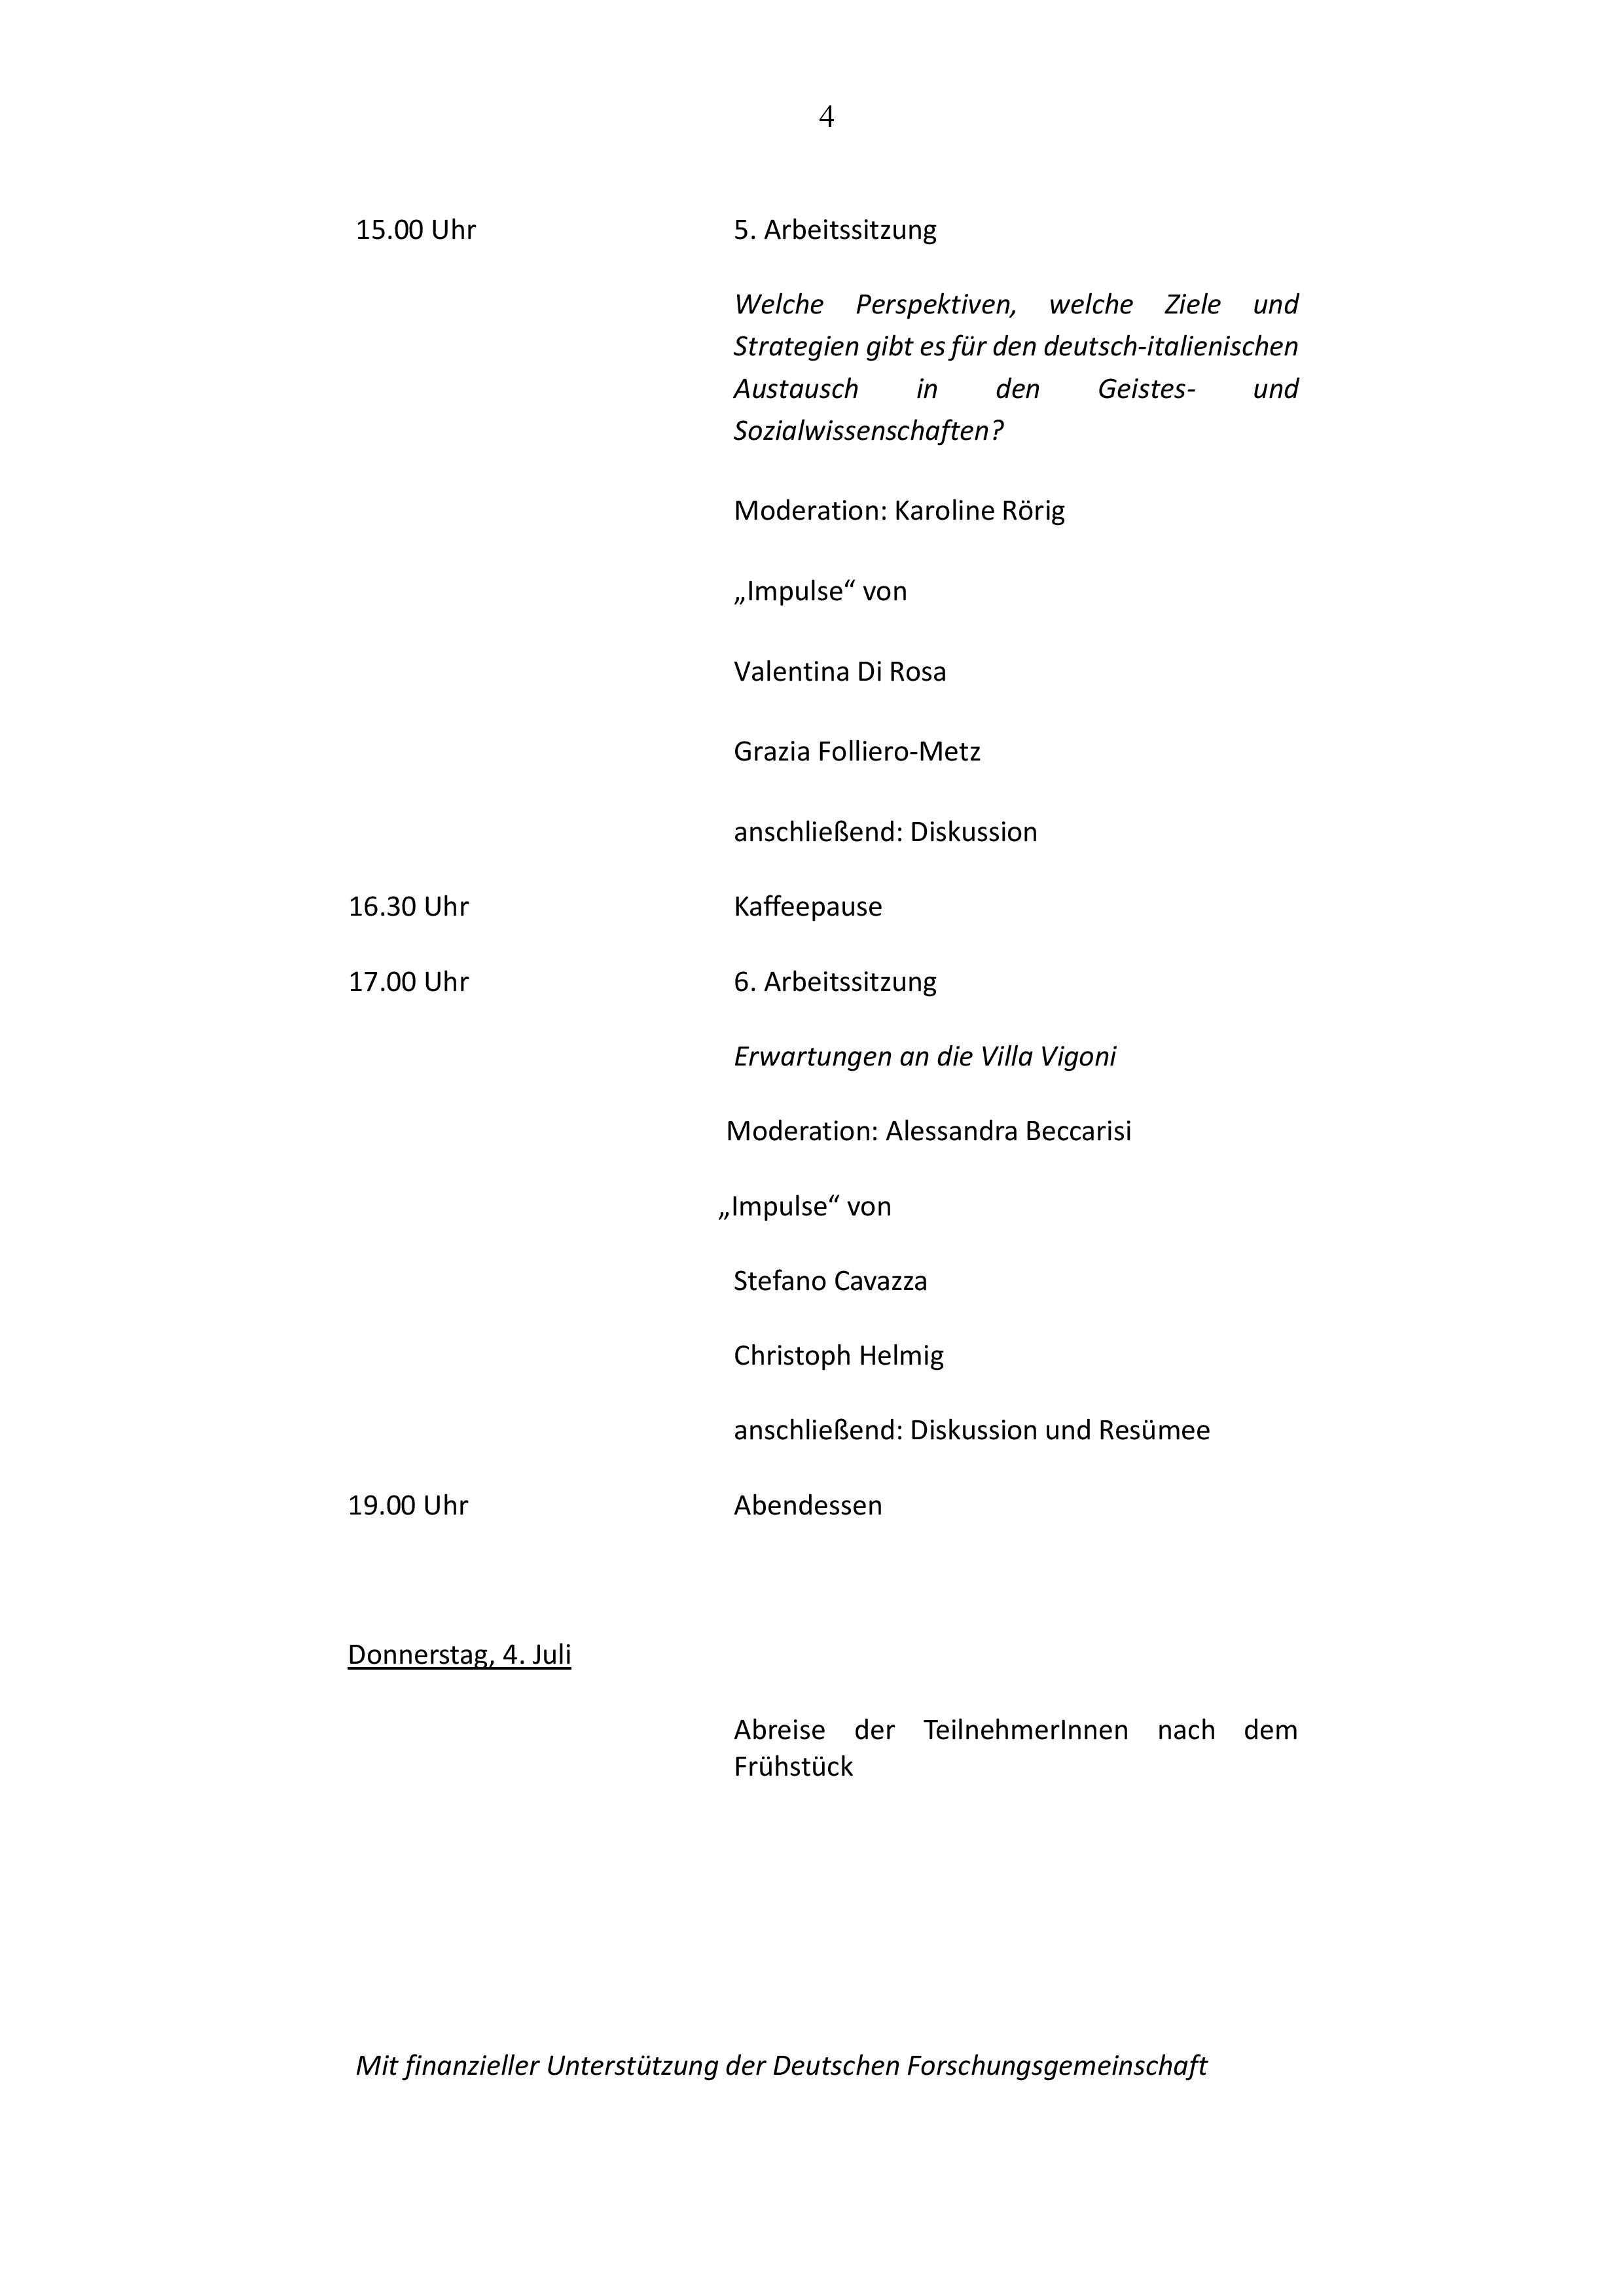 Programm-Workshop_06-06-2019-1-page-004